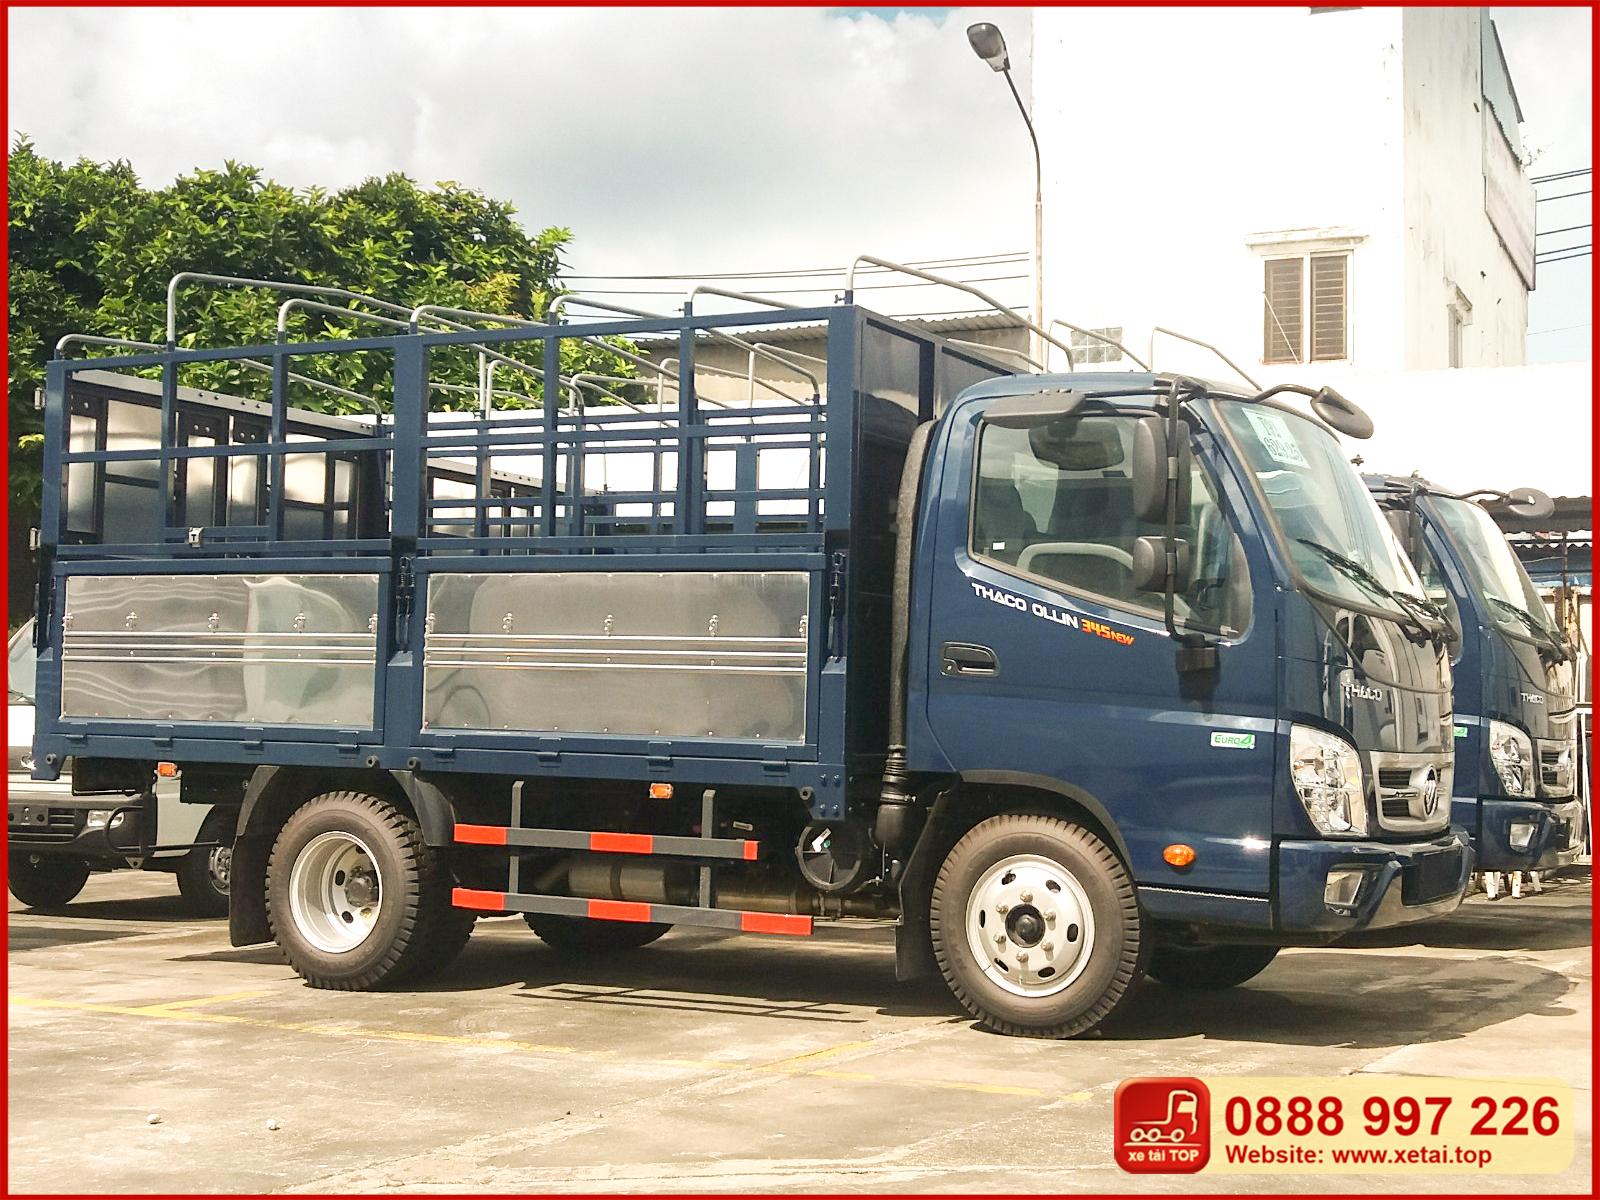 xe-tải-OLLIN-345-tải-trọng-2.4-tấn